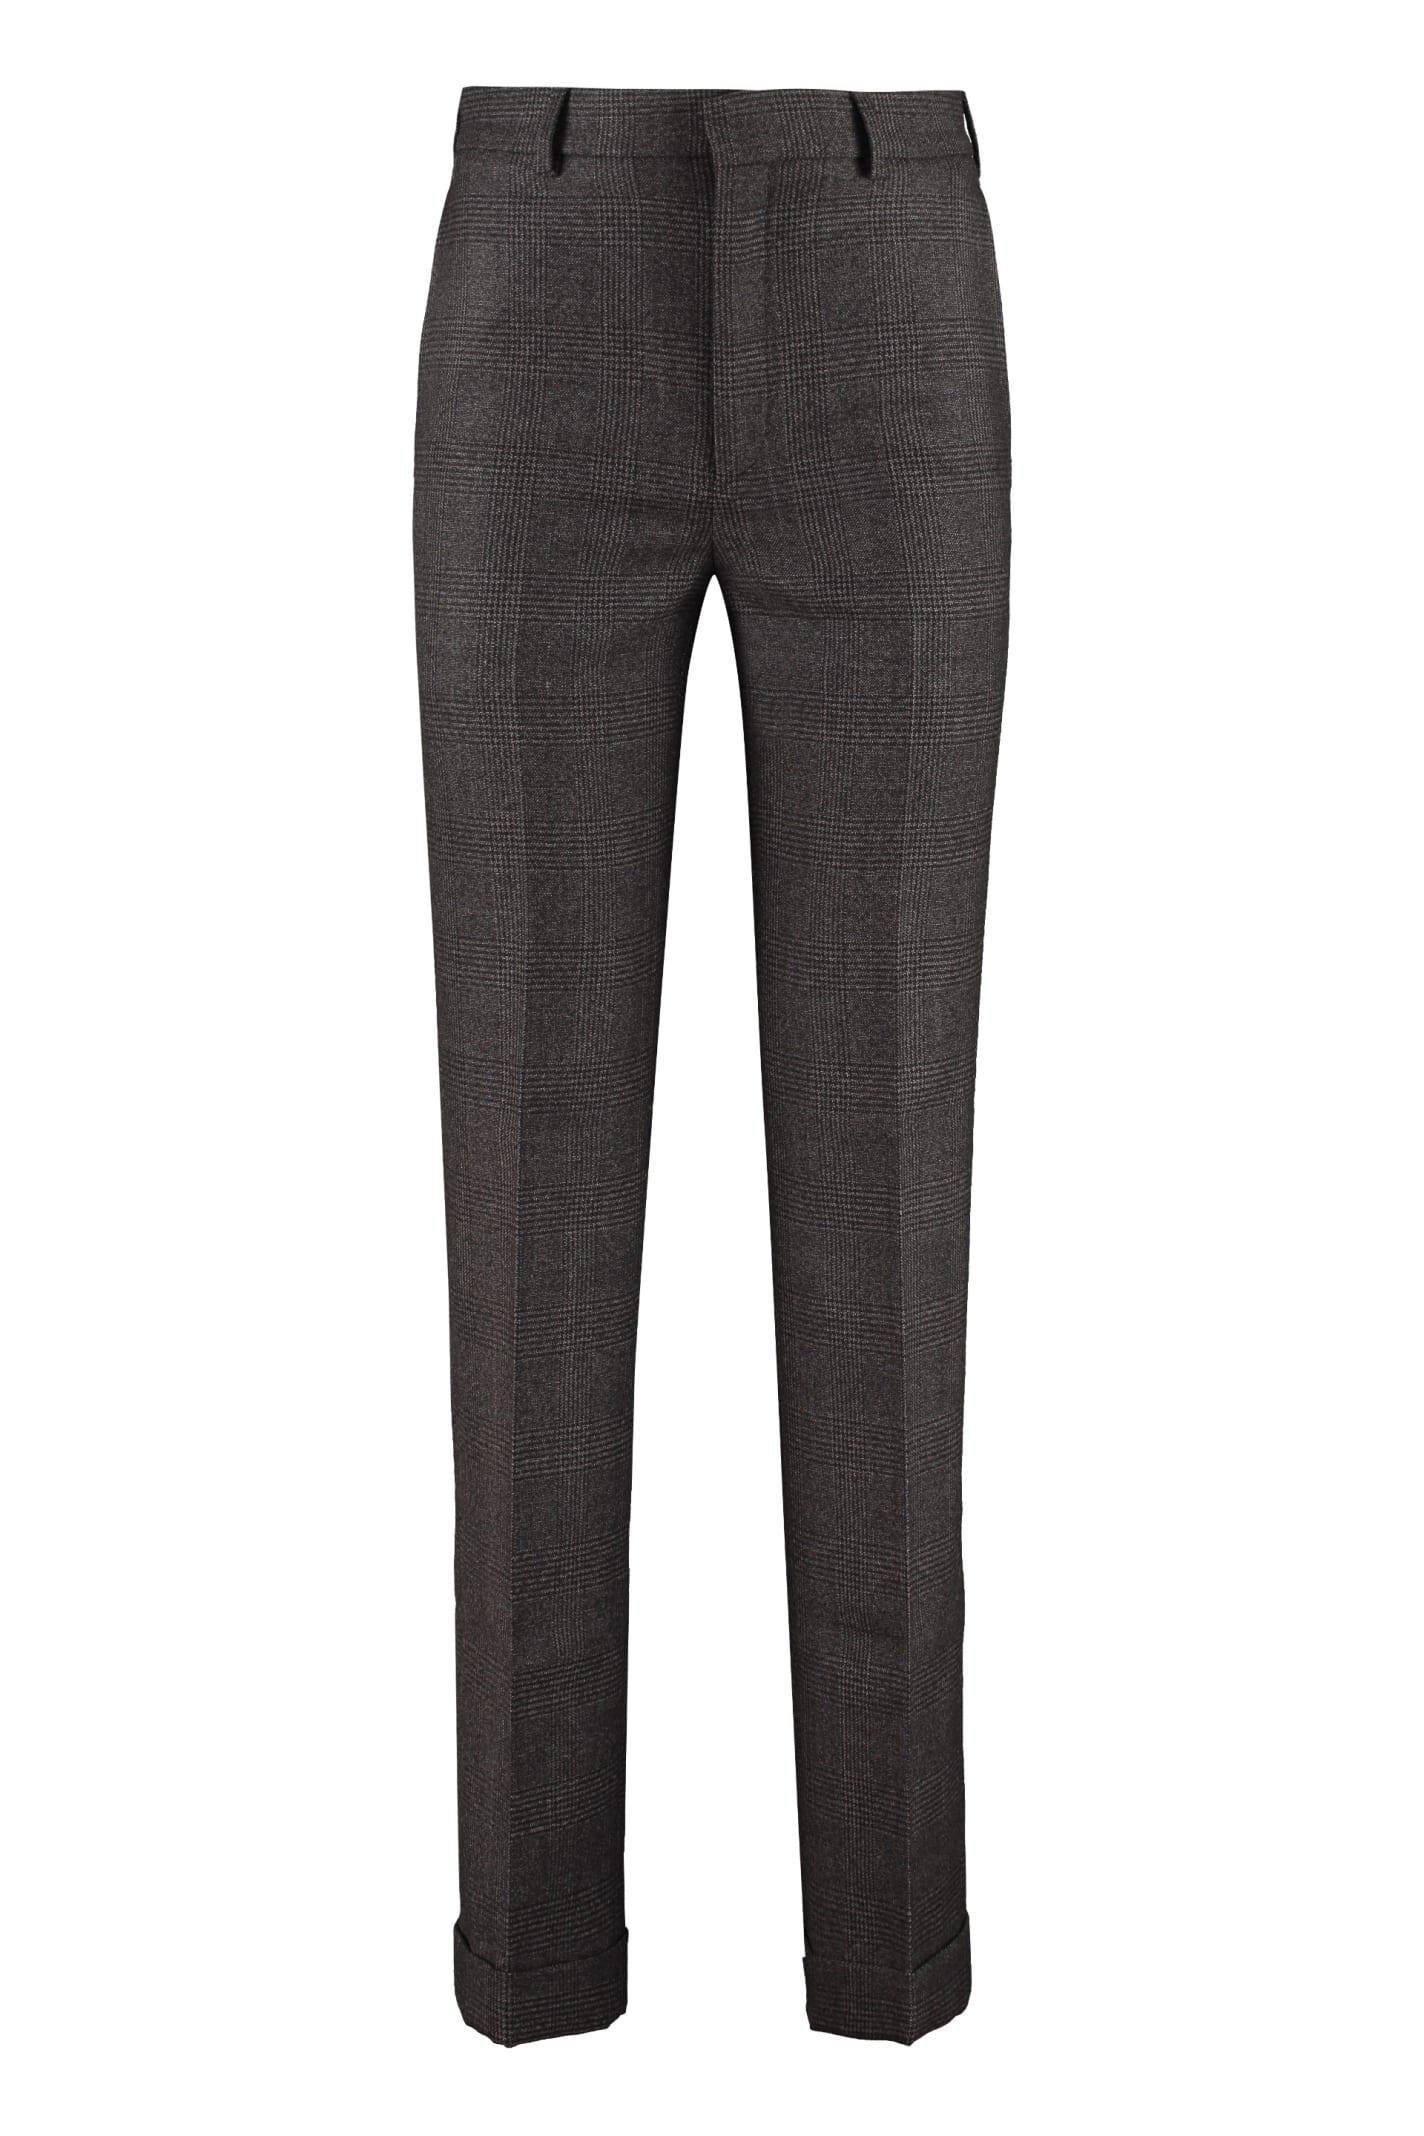 Celine Tailored Wool Trousers